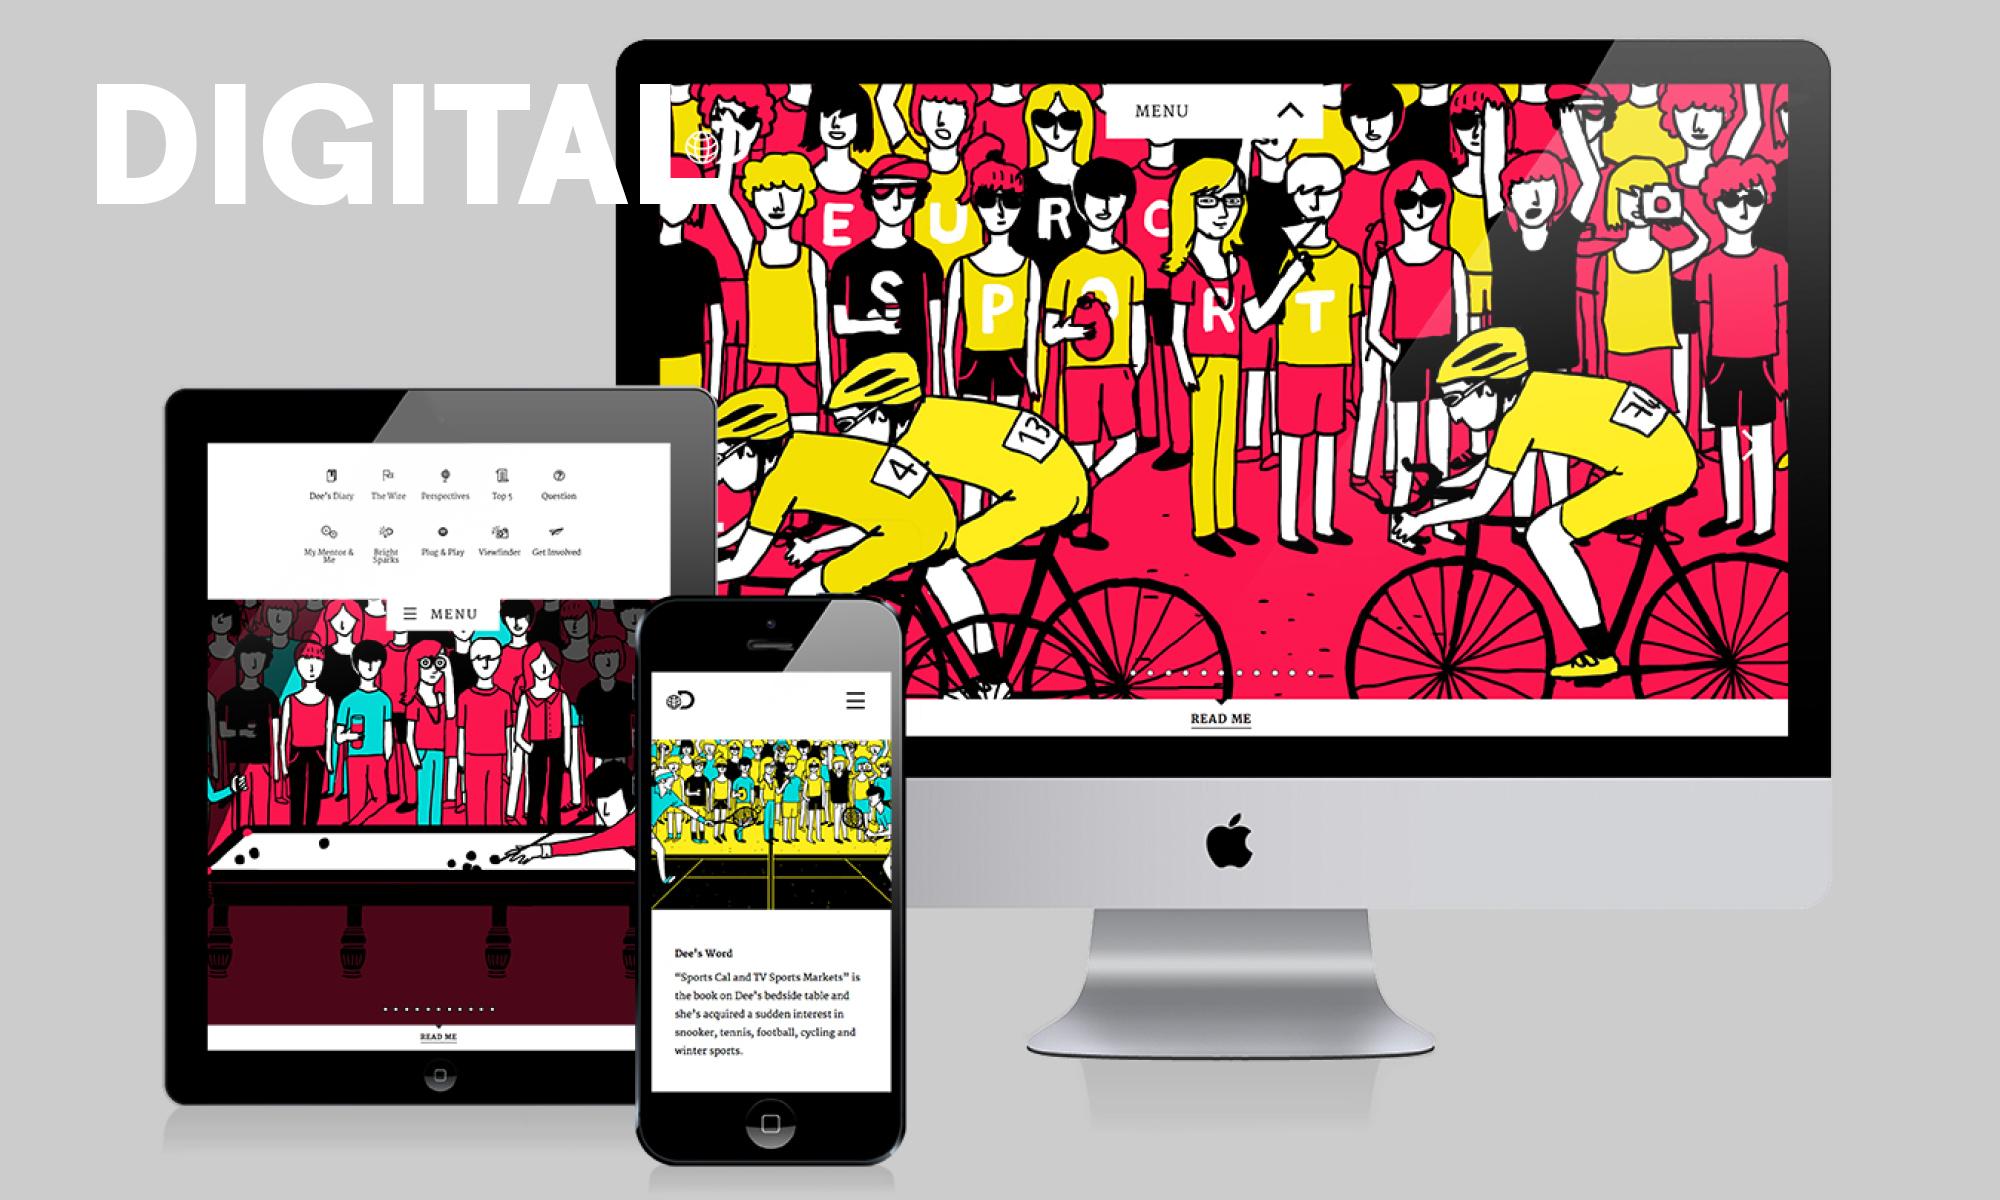 Digital design and production for brand marketing website apps